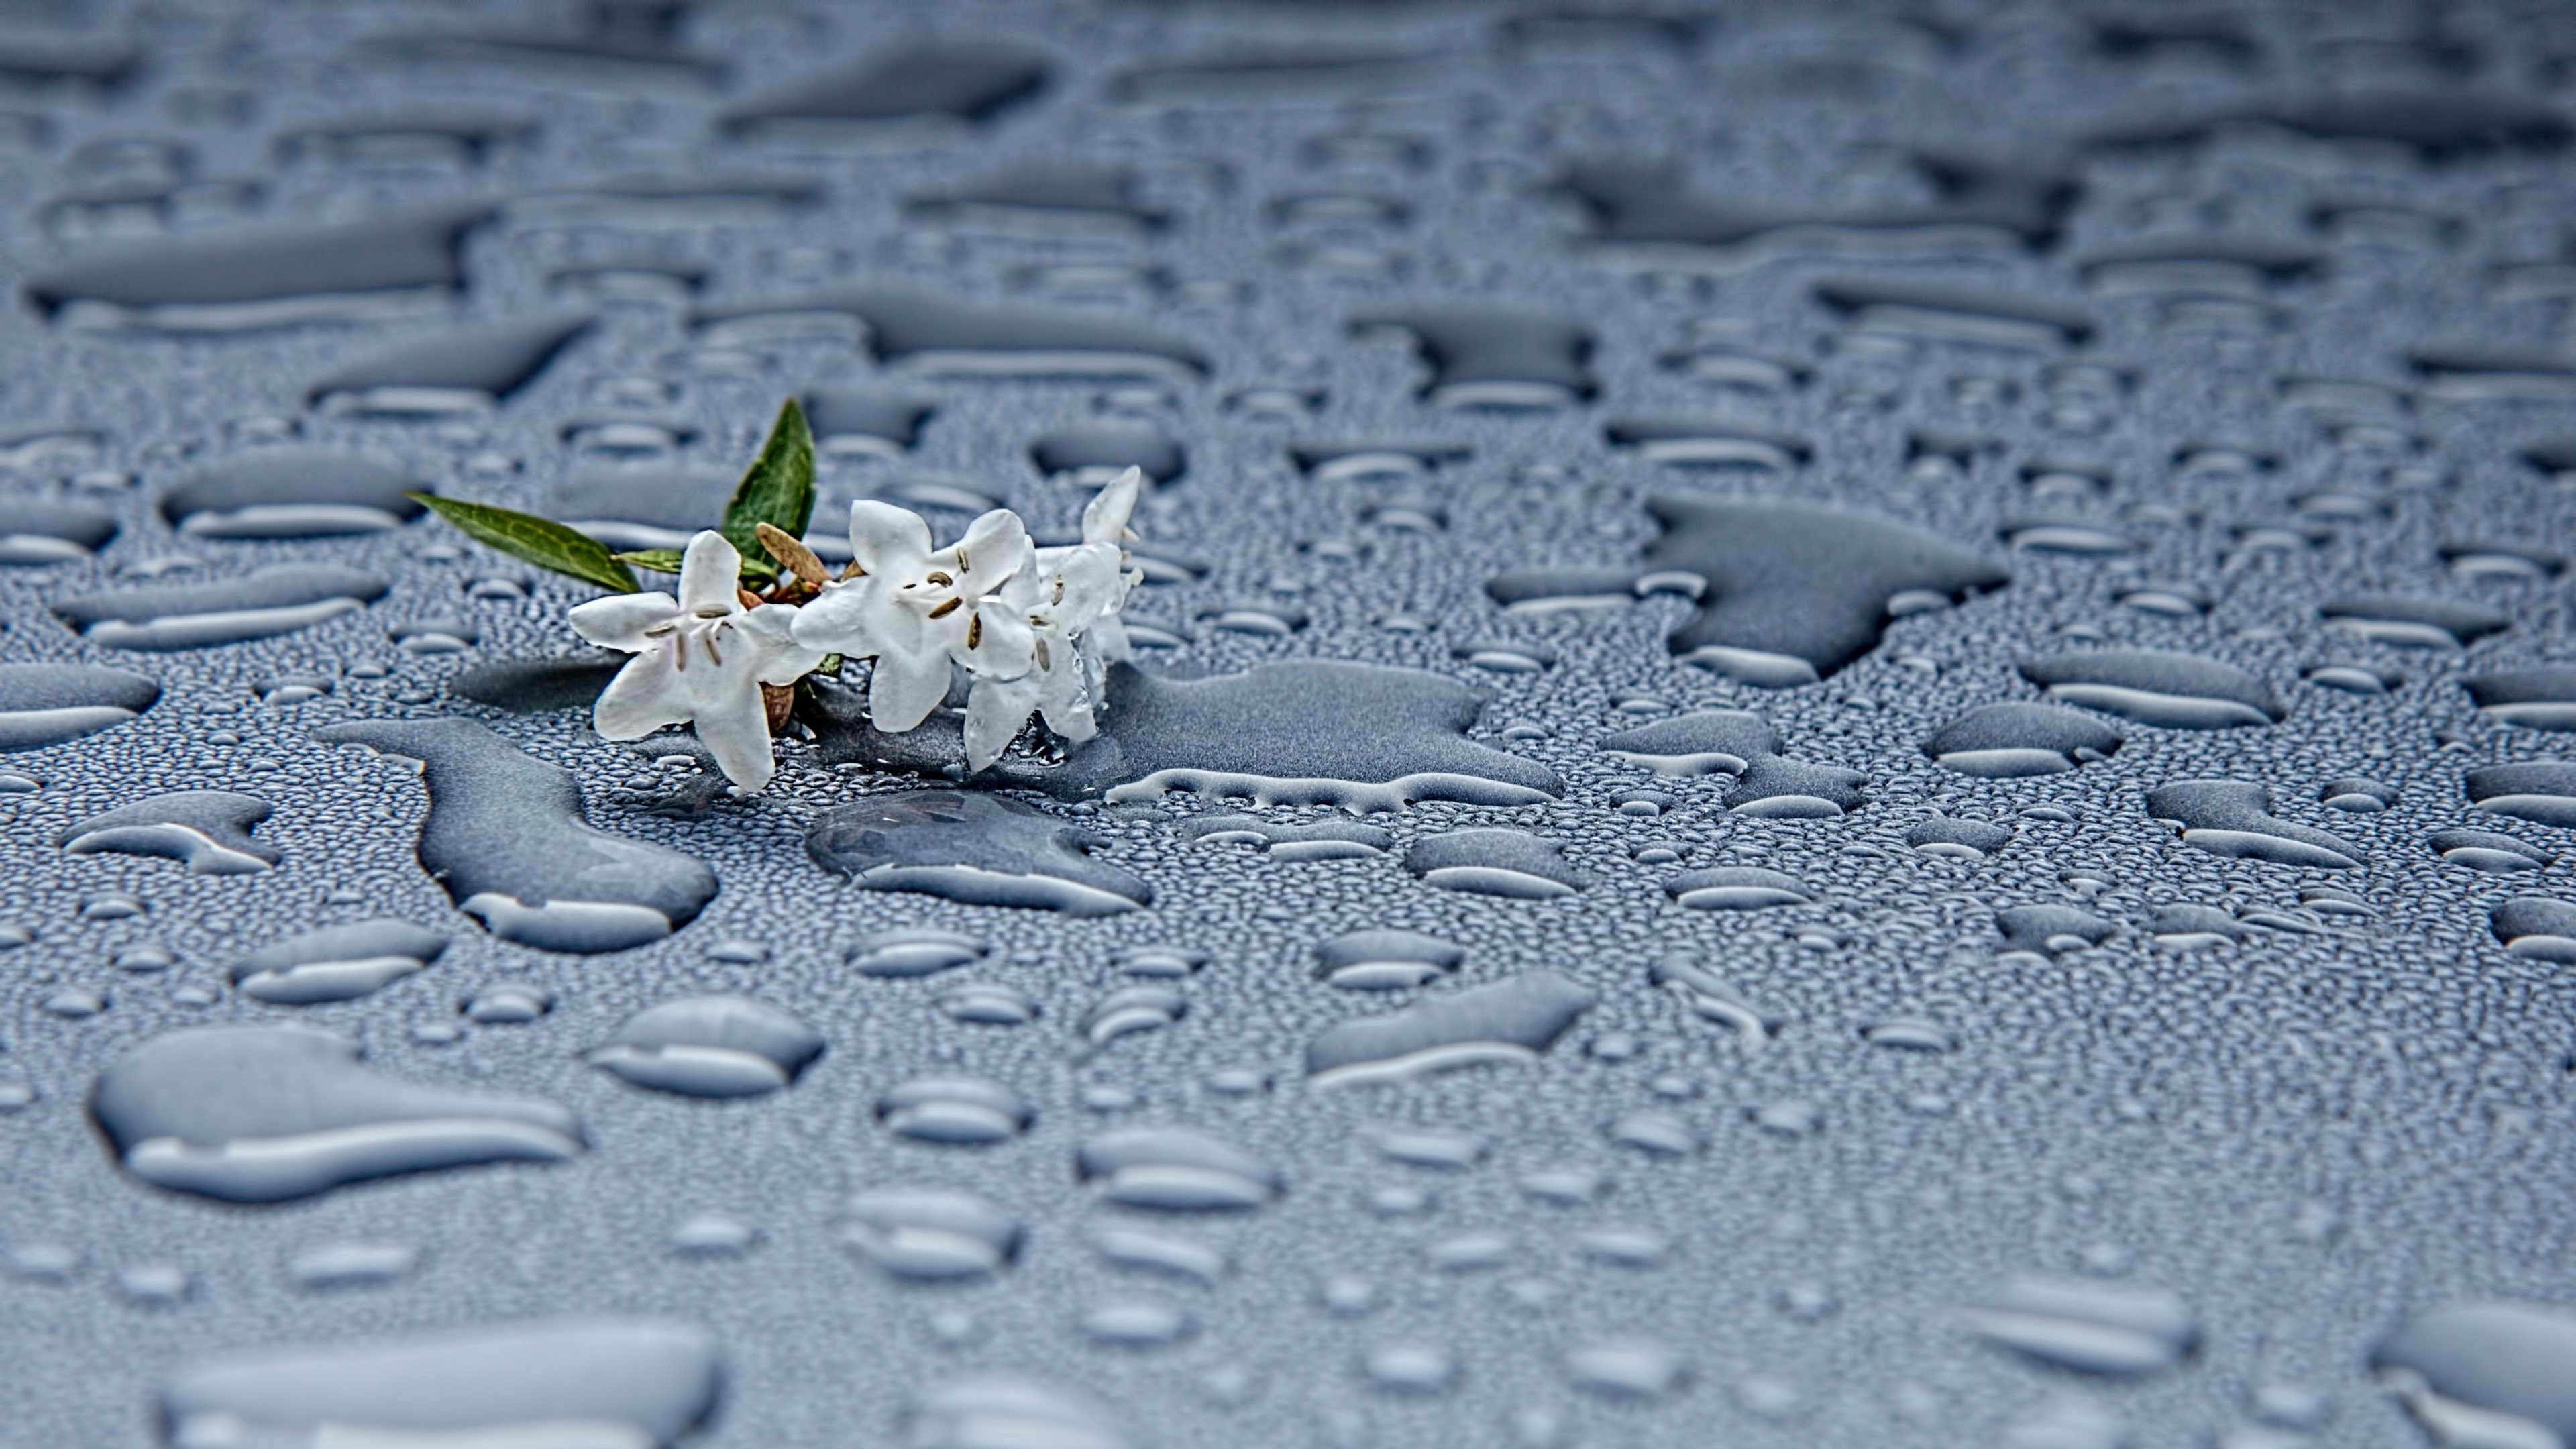 Wallpaper: Rain drops and white flowers